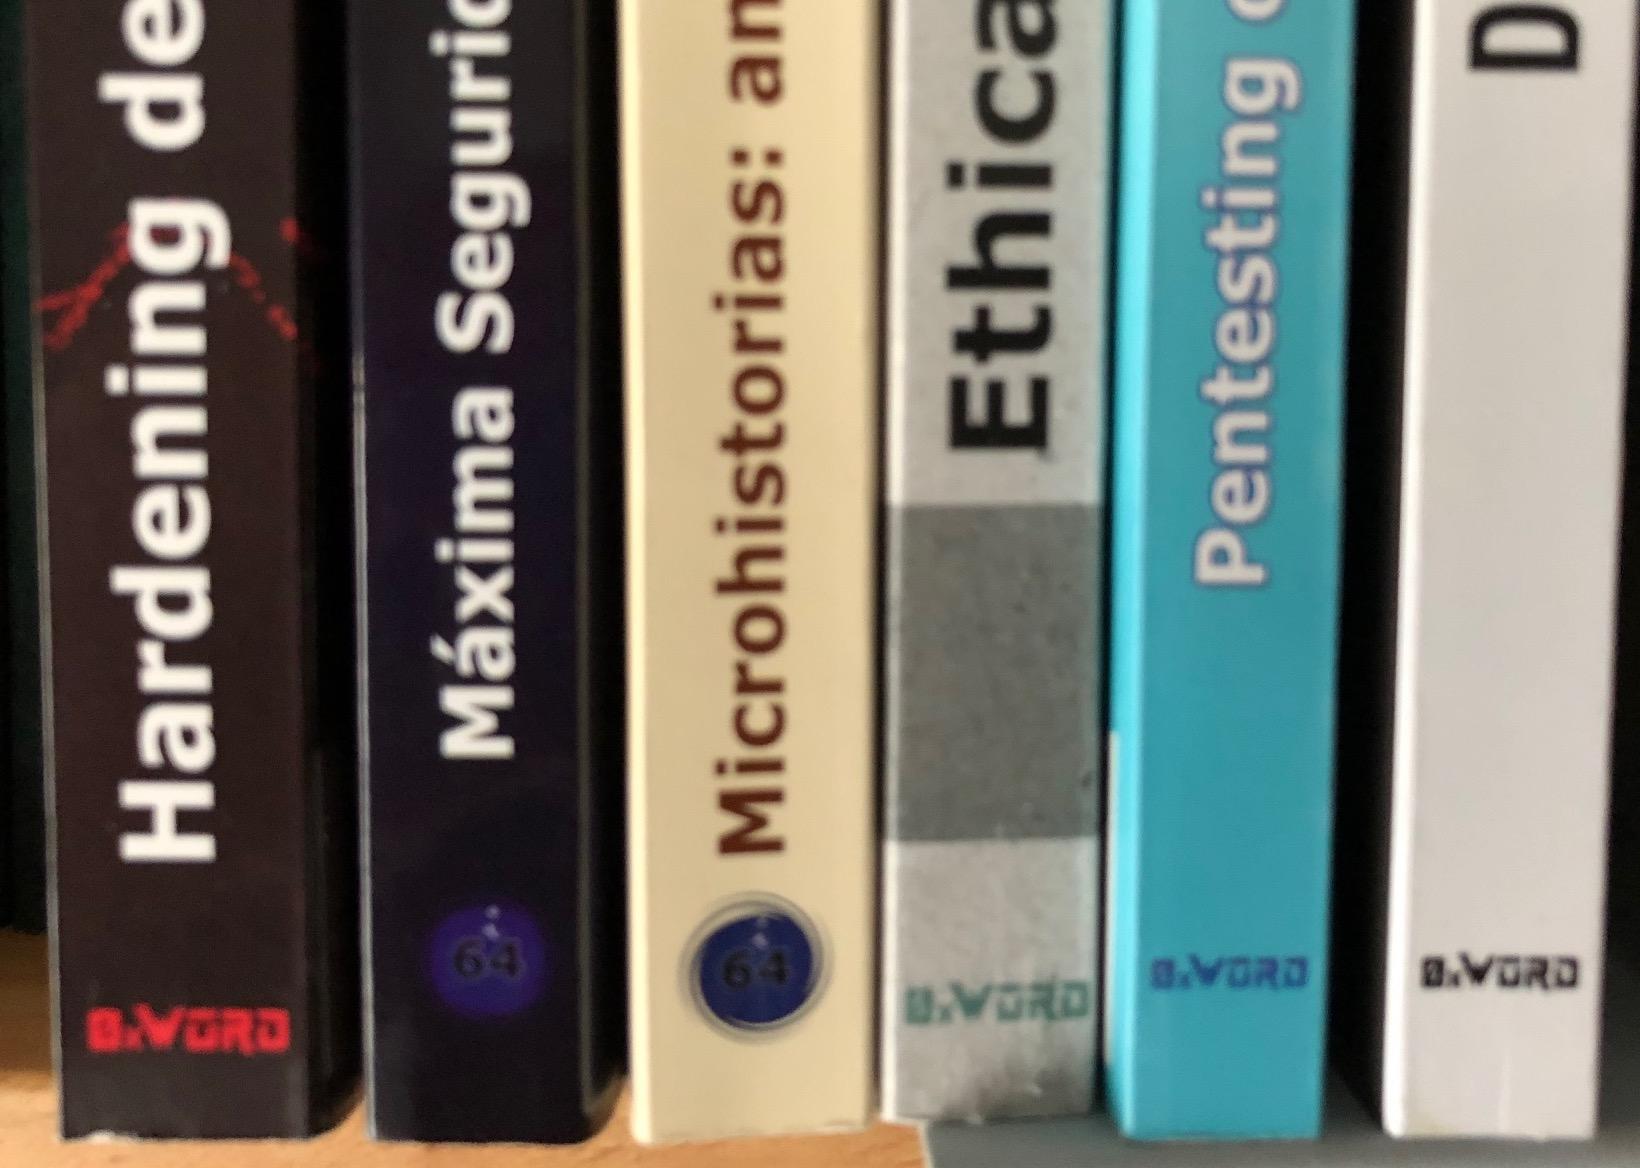 file libros 0xword jpg wikimedia commons